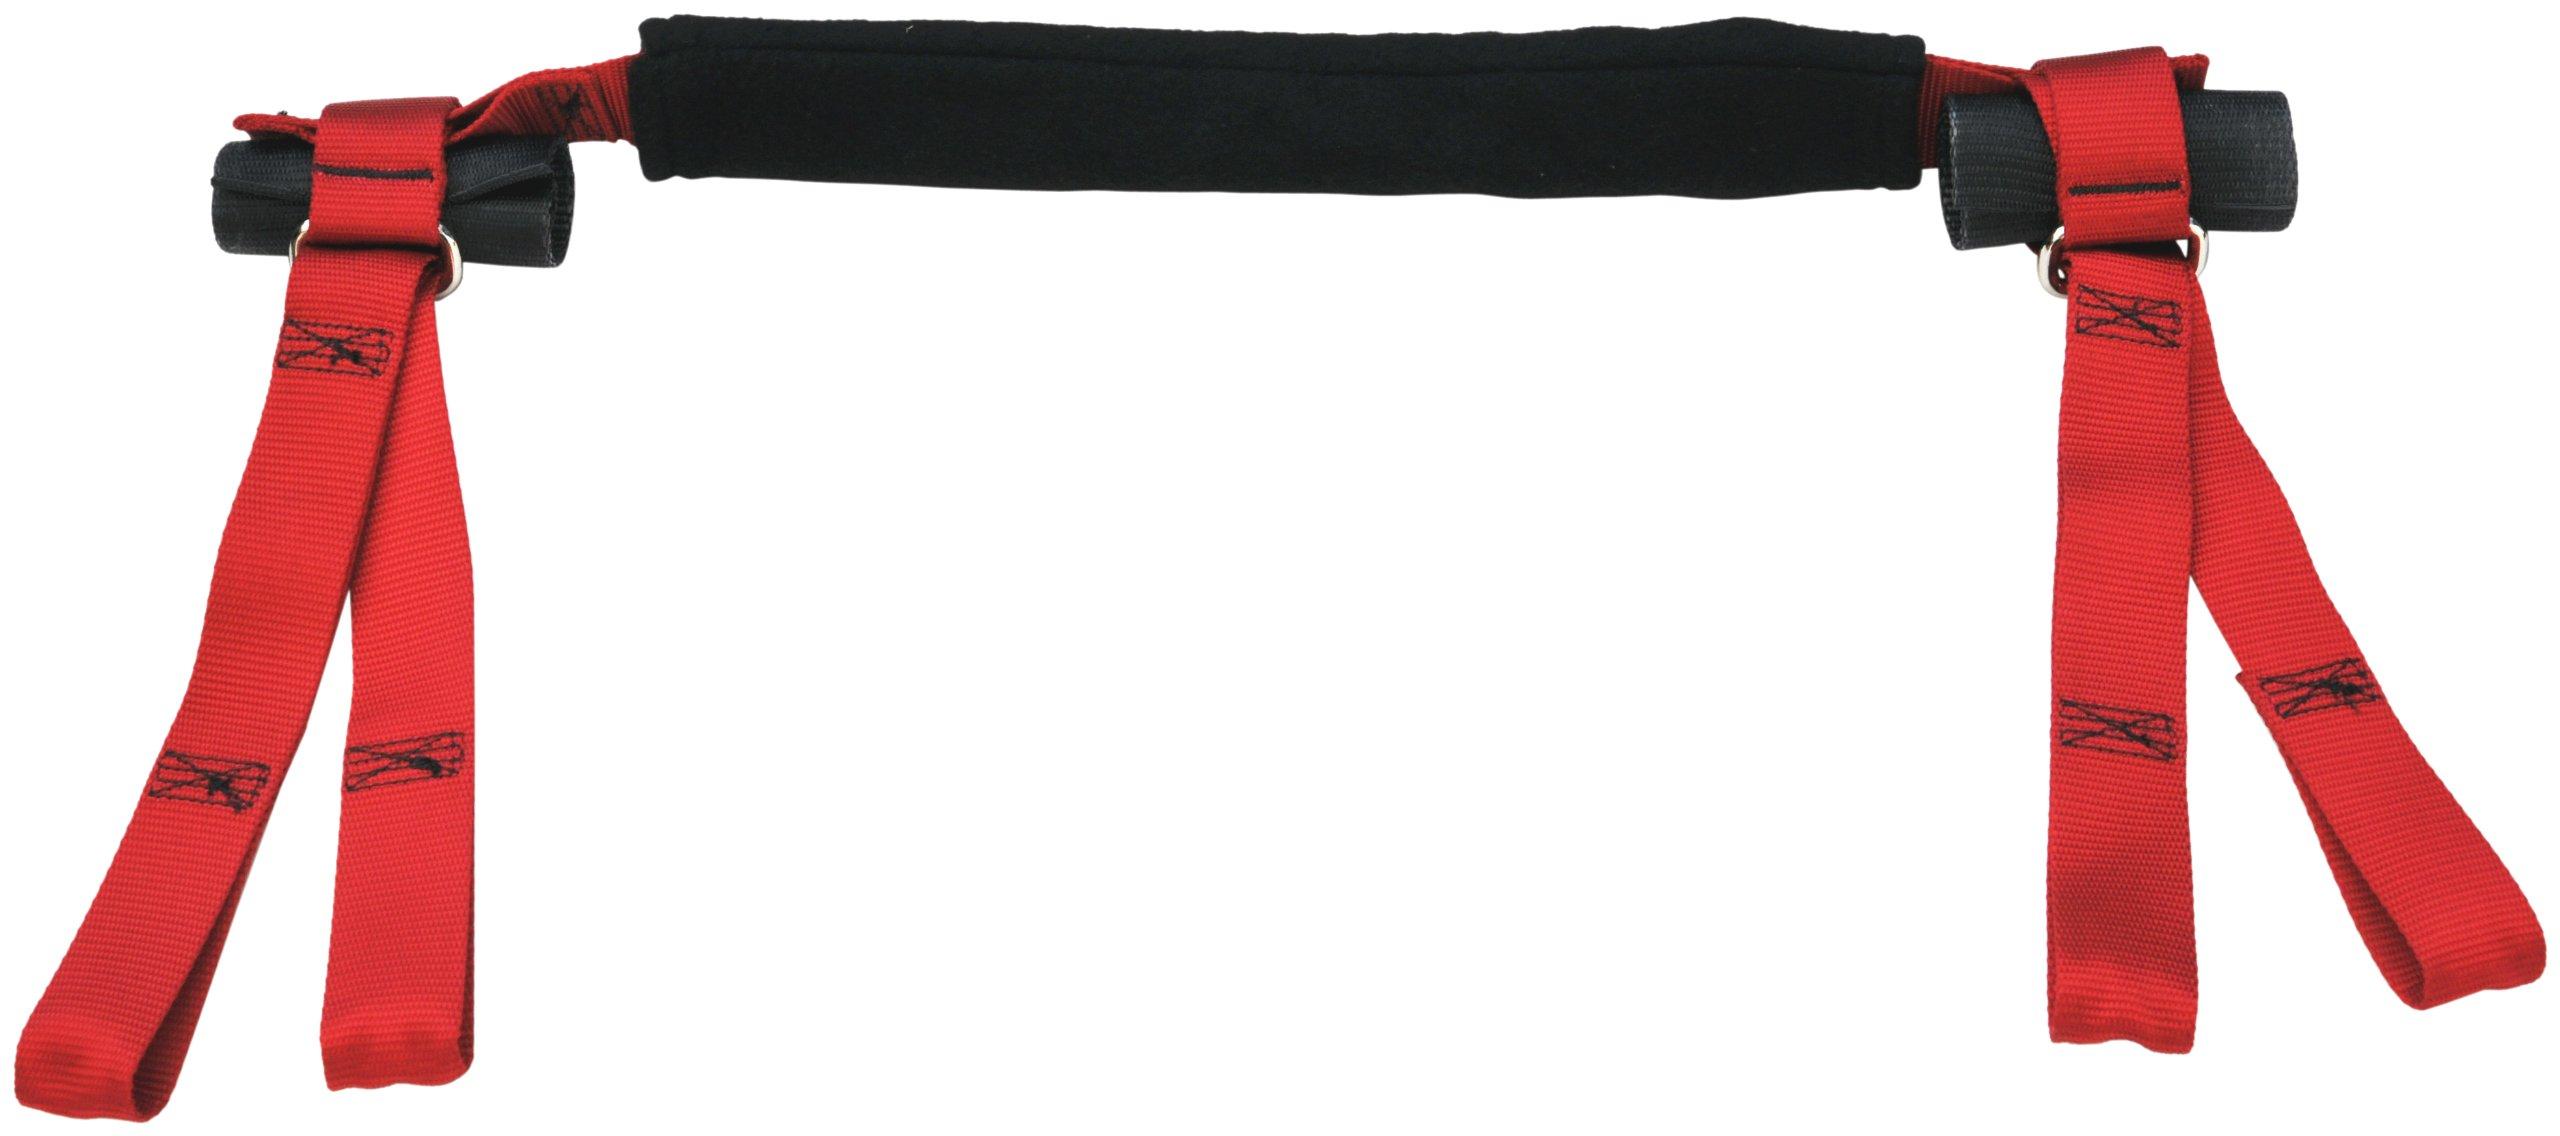 HighRoller HR601-30 Red Handlebar Harness